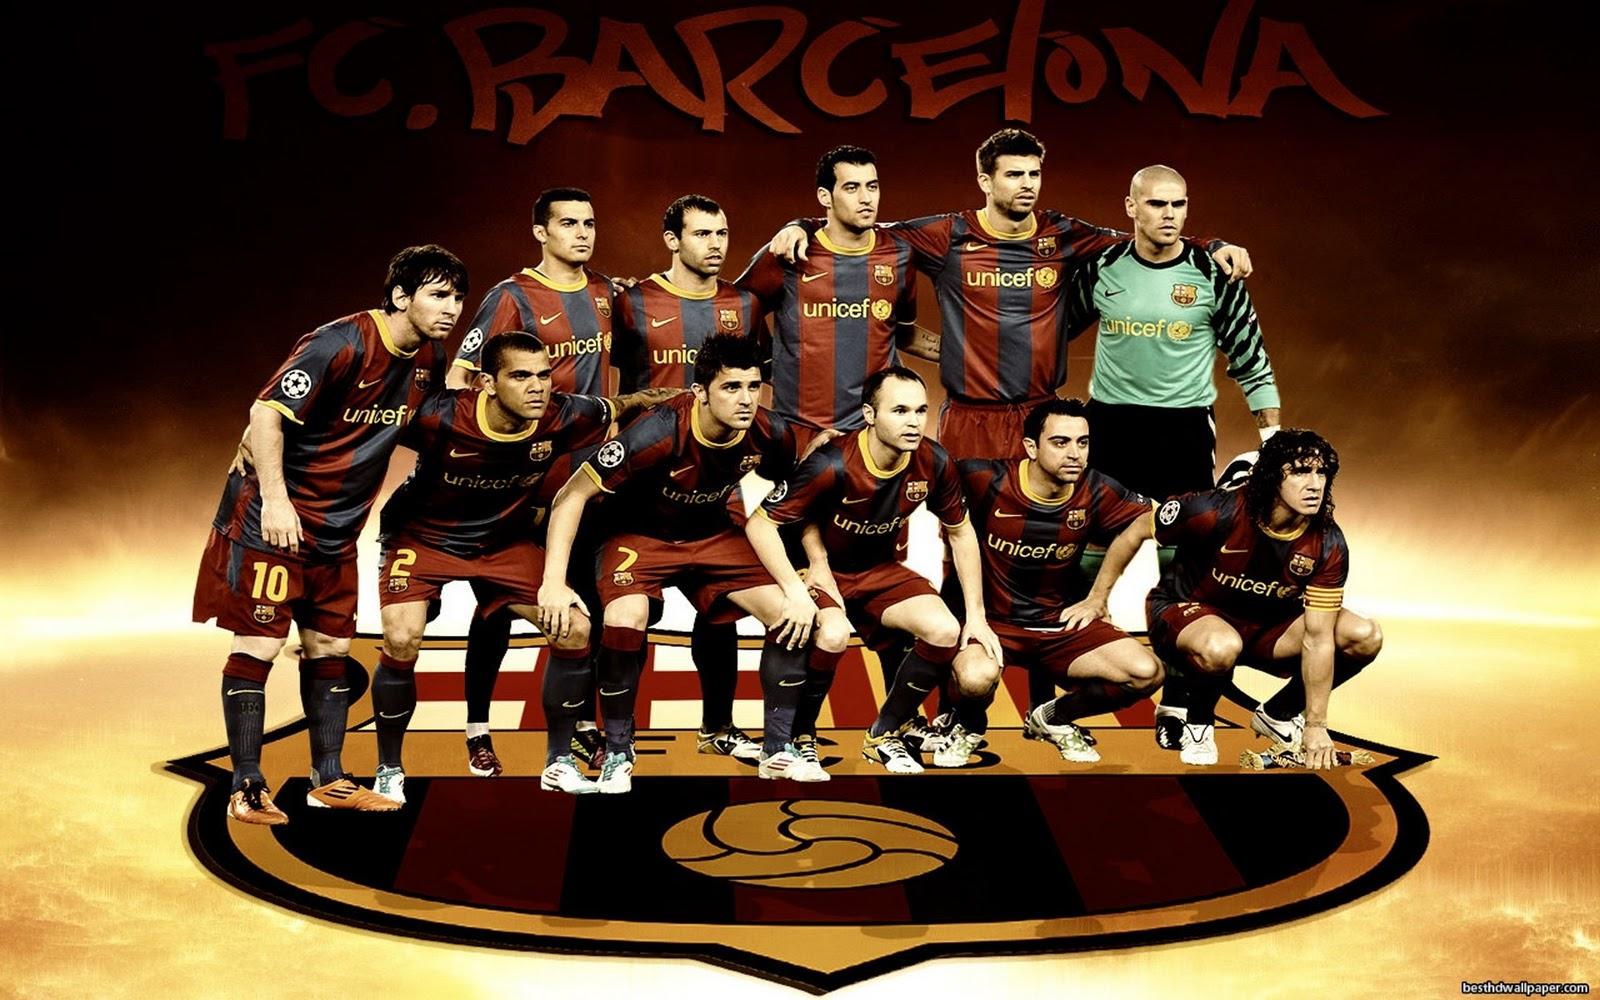 http://1.bp.blogspot.com/-nLDuQQMKZ0Y/UY-GBox4FZI/AAAAAAAAI4I/6KUy-H54PiI/s1600/FC+Barcelona+hd+wallpaper+2013+21.jpg